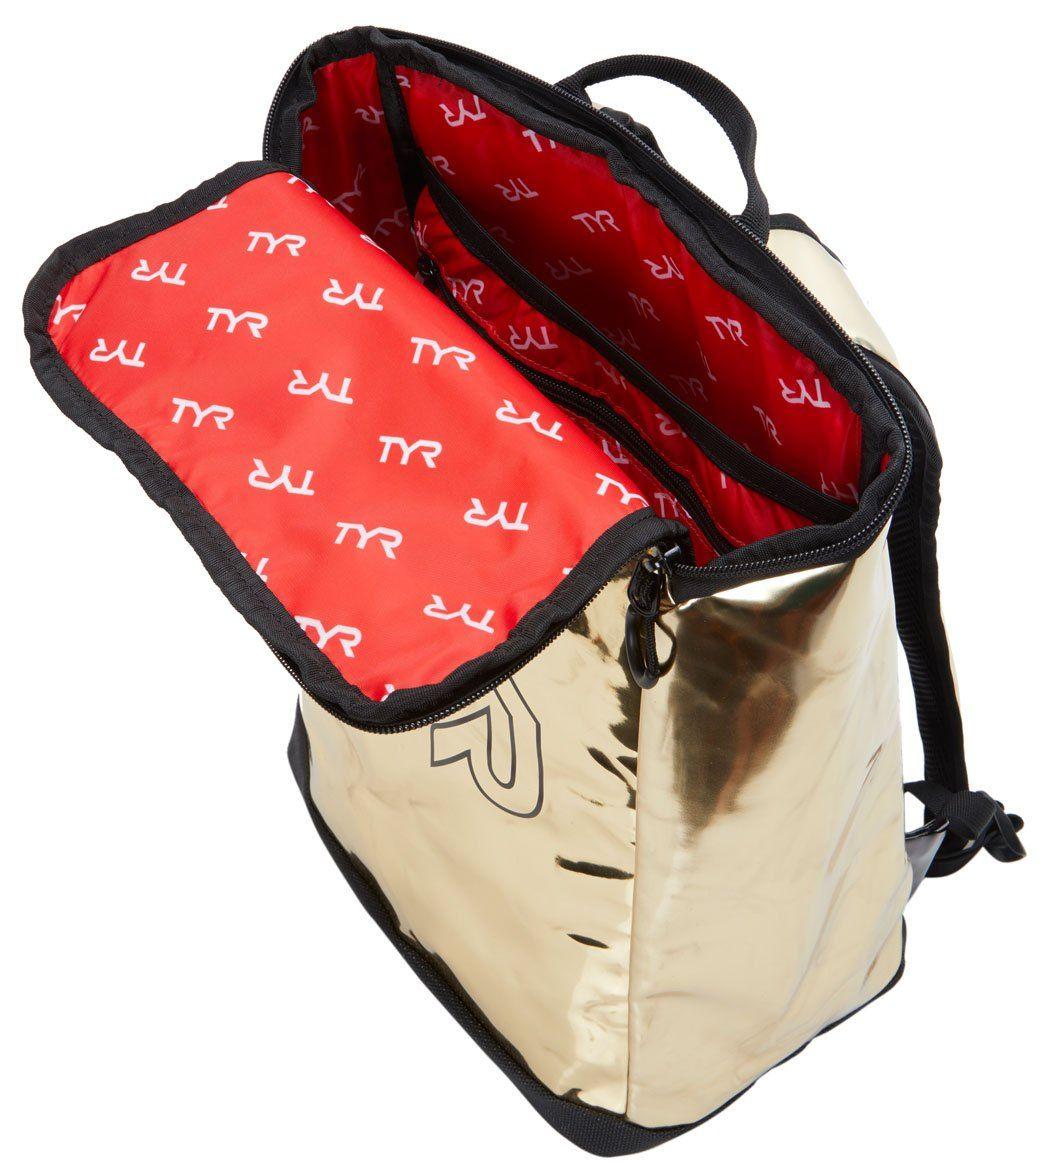 рюкзак Tyr Get Down 23l Backpack купить за 5990 руб в интернет